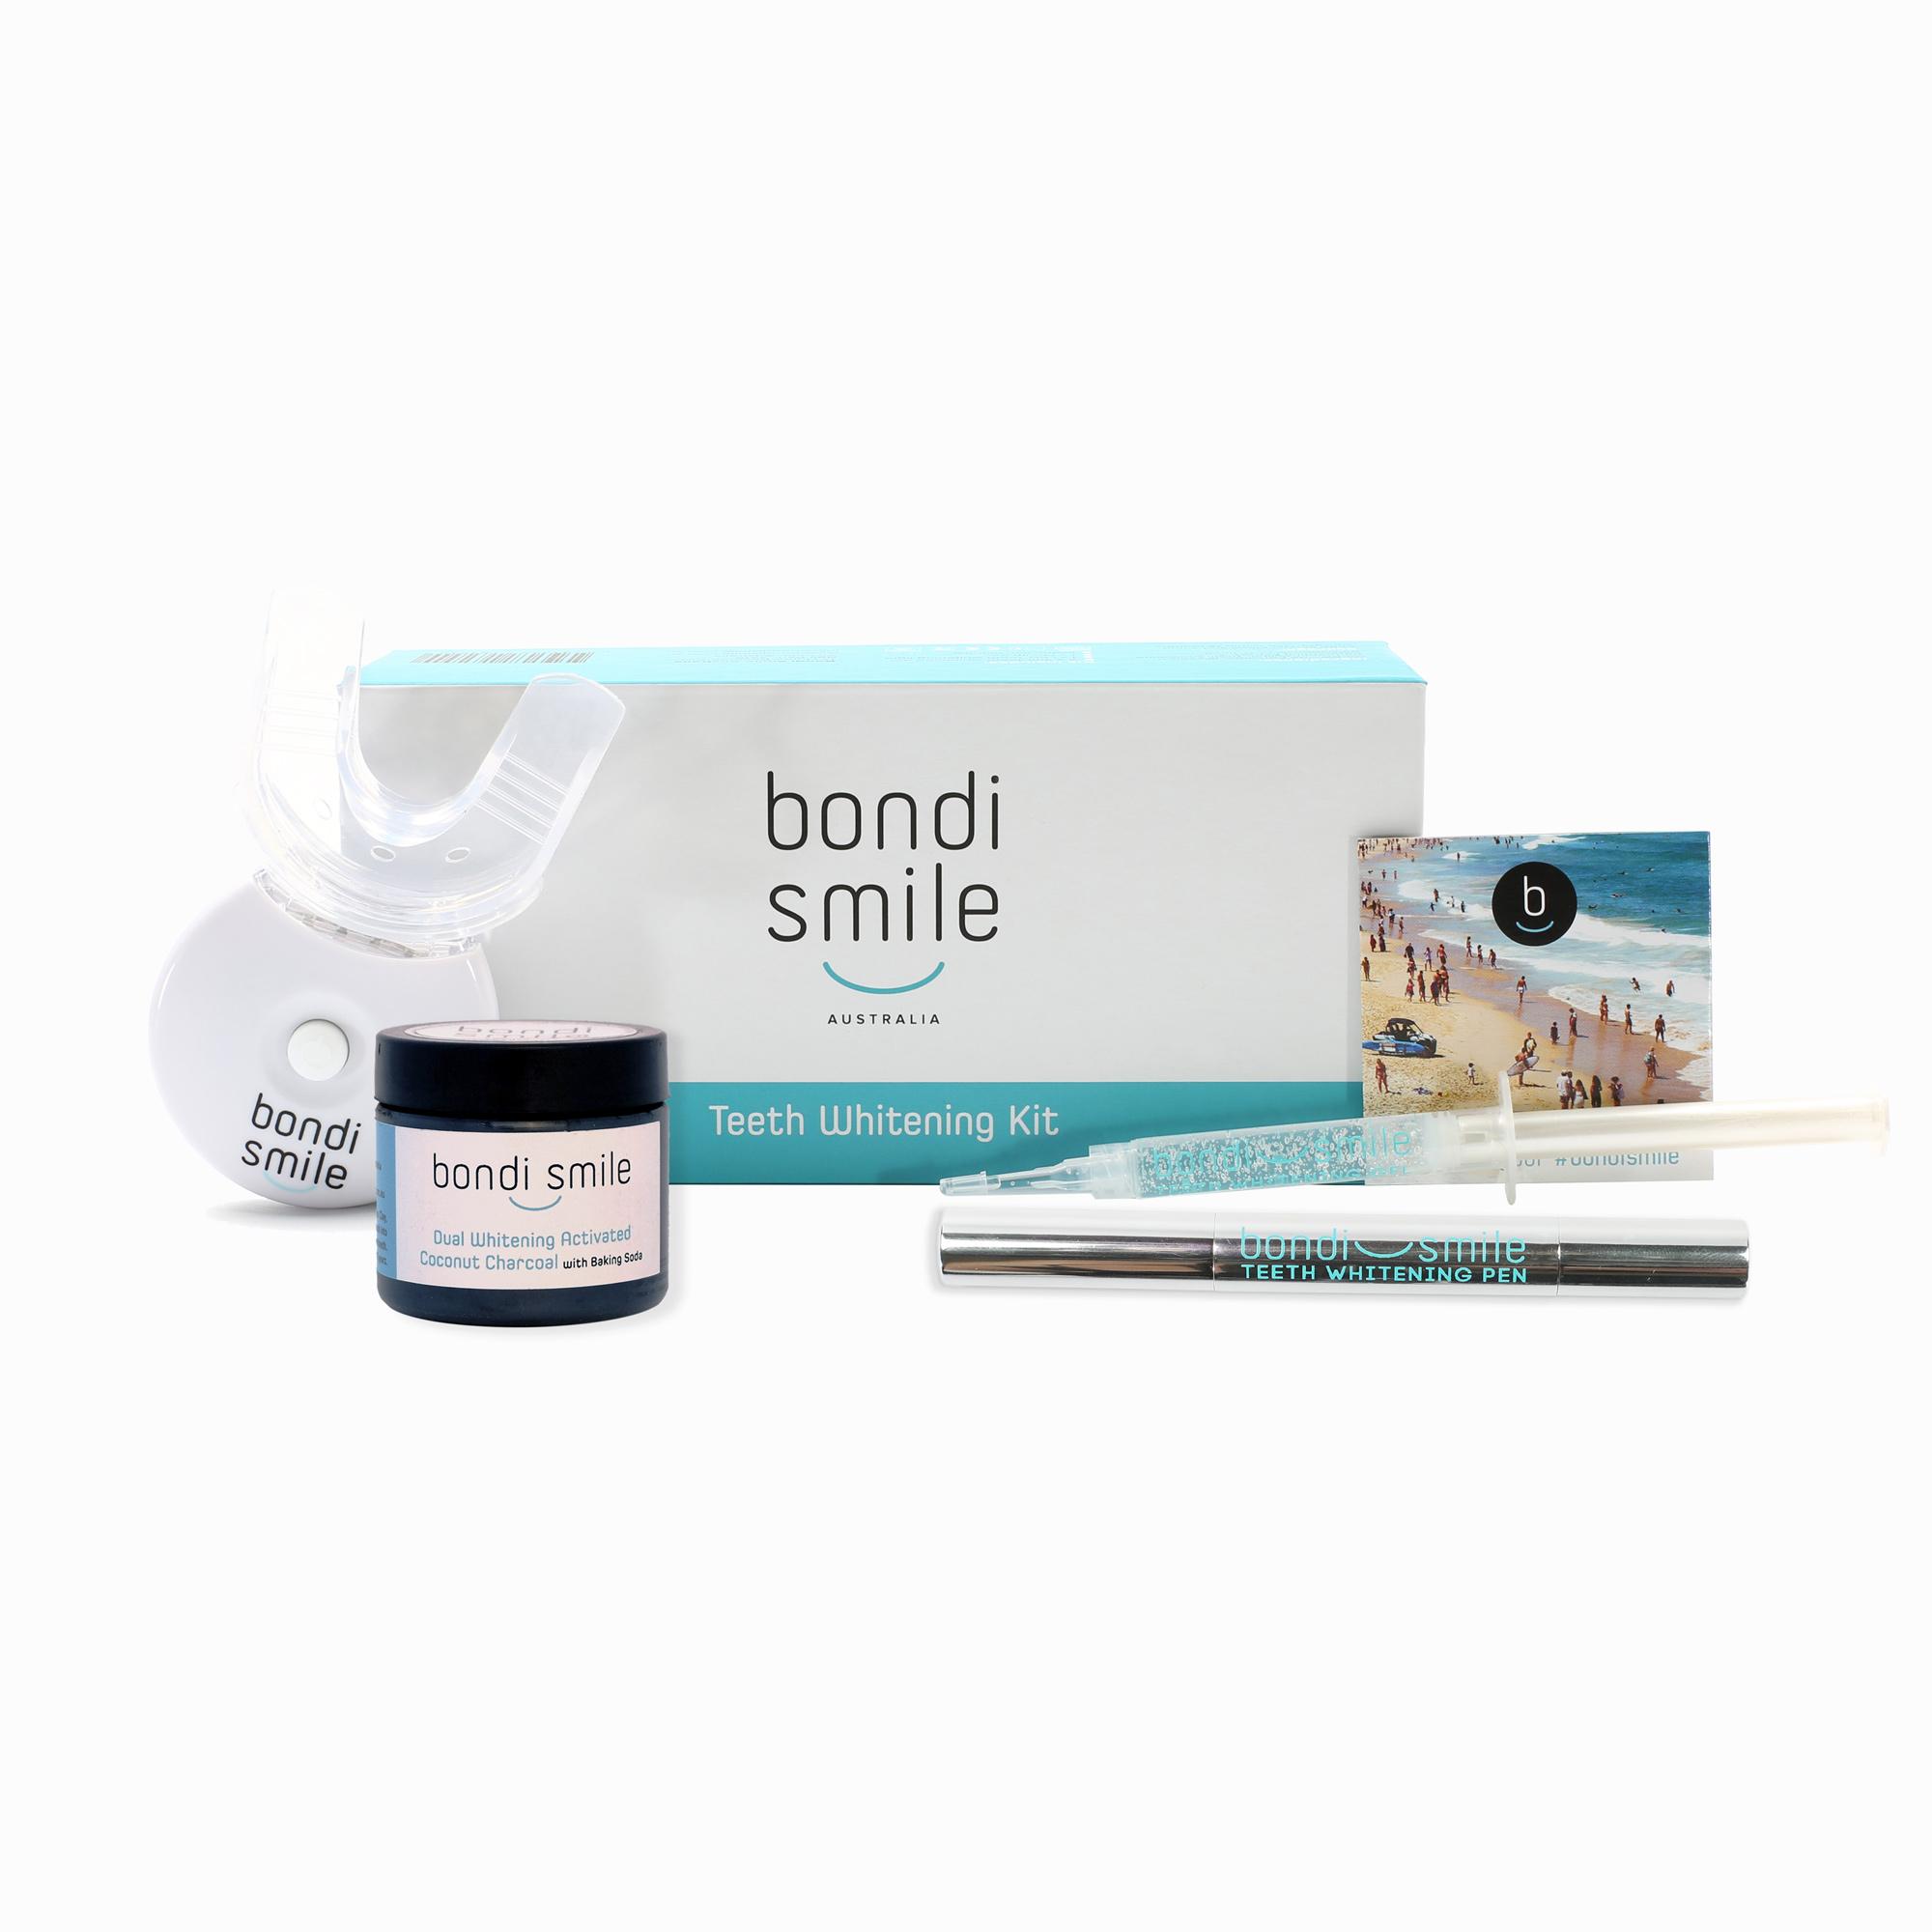 Nhs Discounts Teeth Whitening Health Staff Discounts